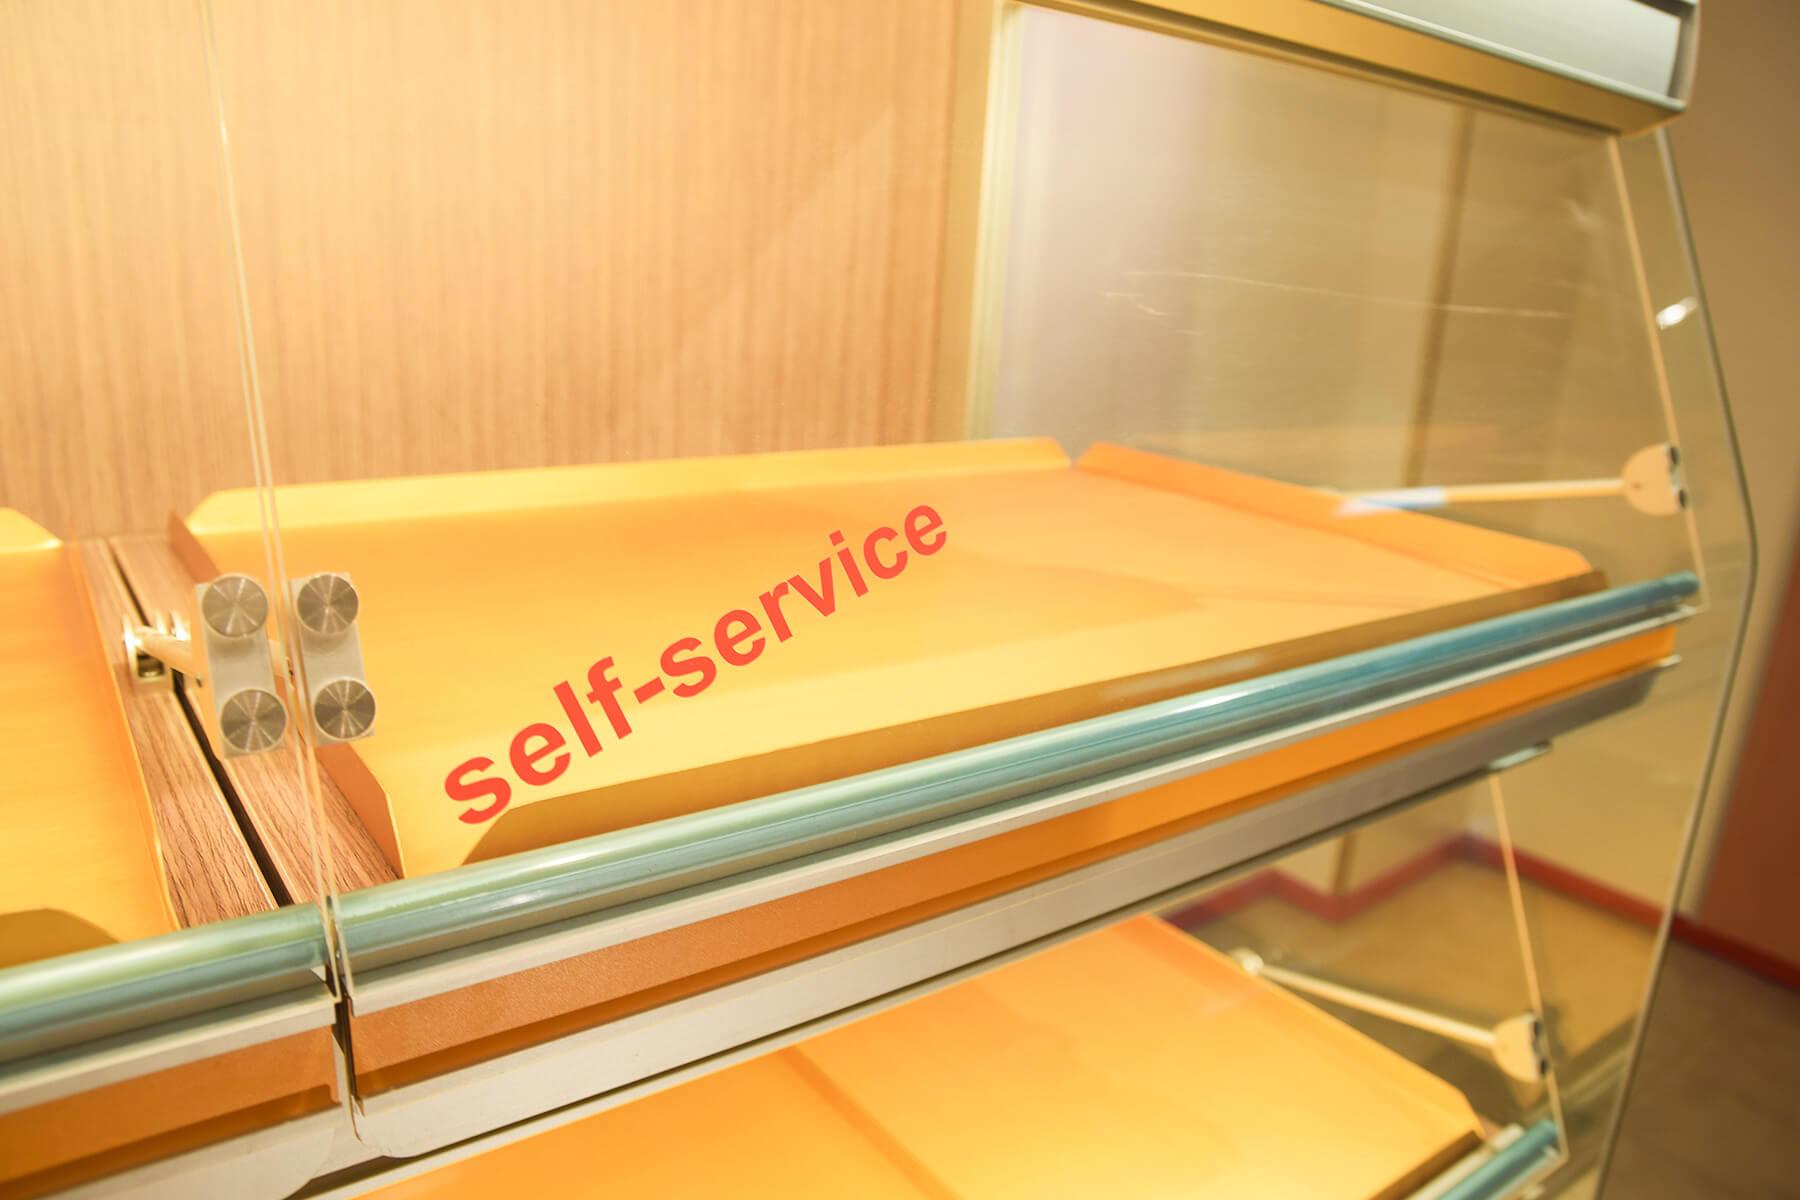 Optima Self-Service Bakery